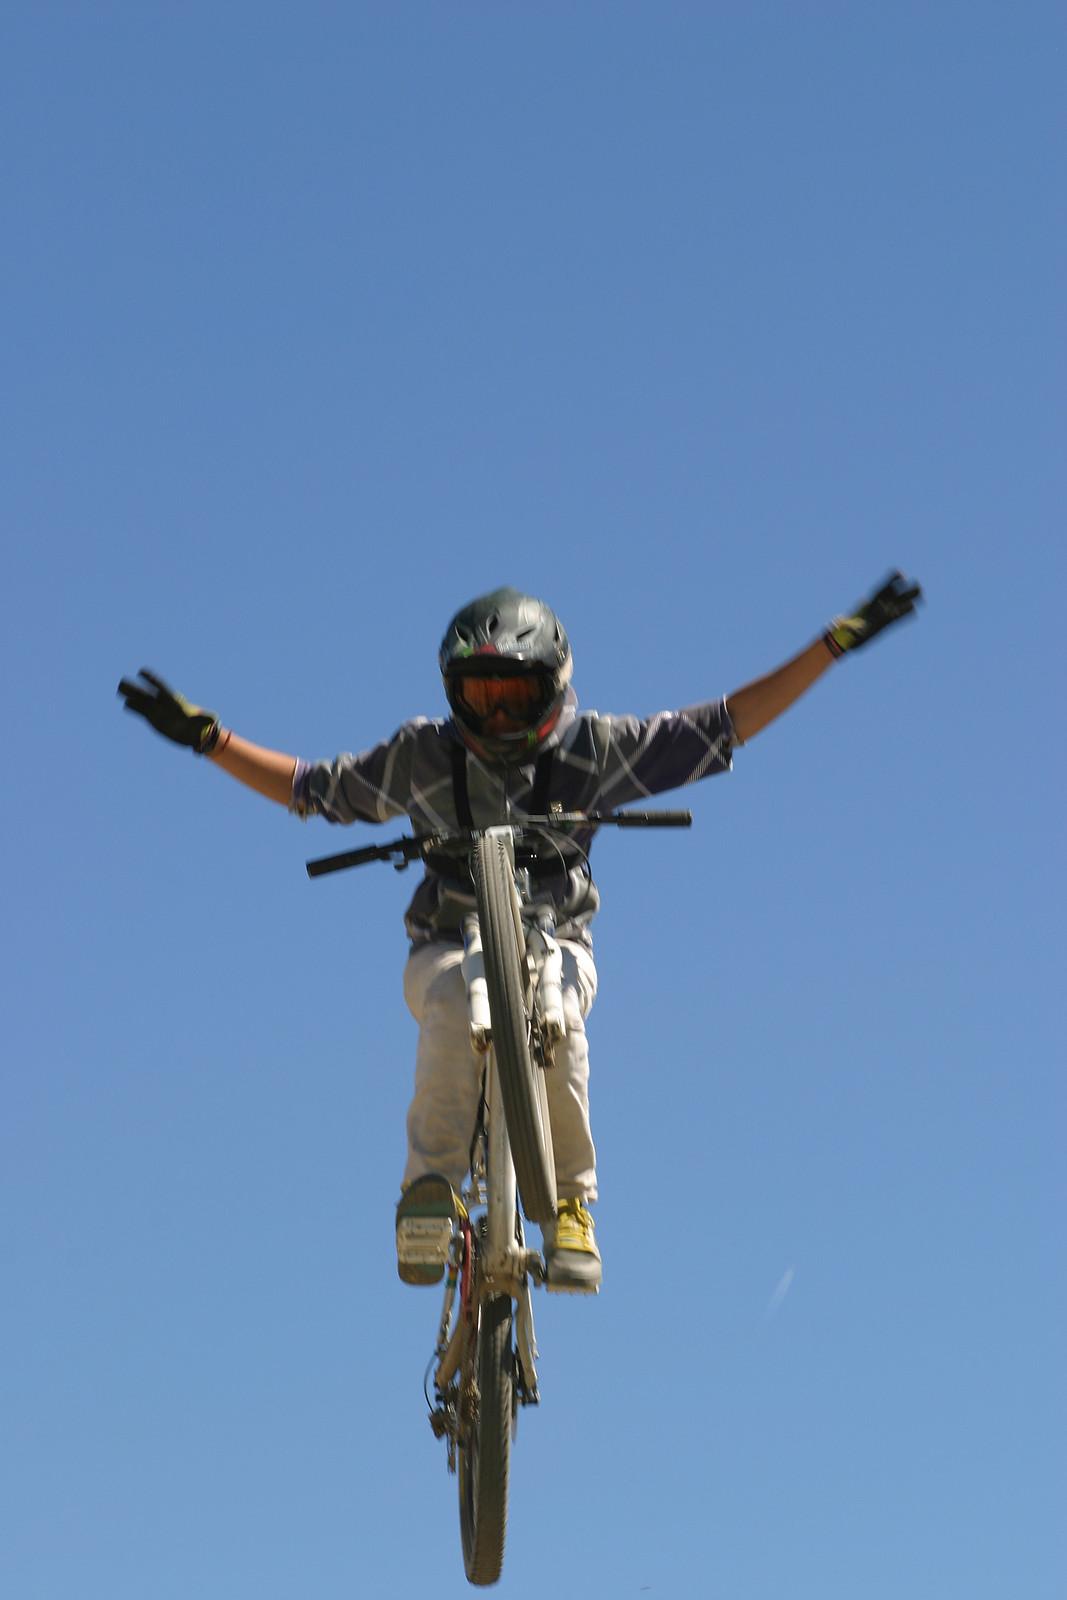 It was ... - jaka.hartman - Mountain Biking Pictures - Vital MTB